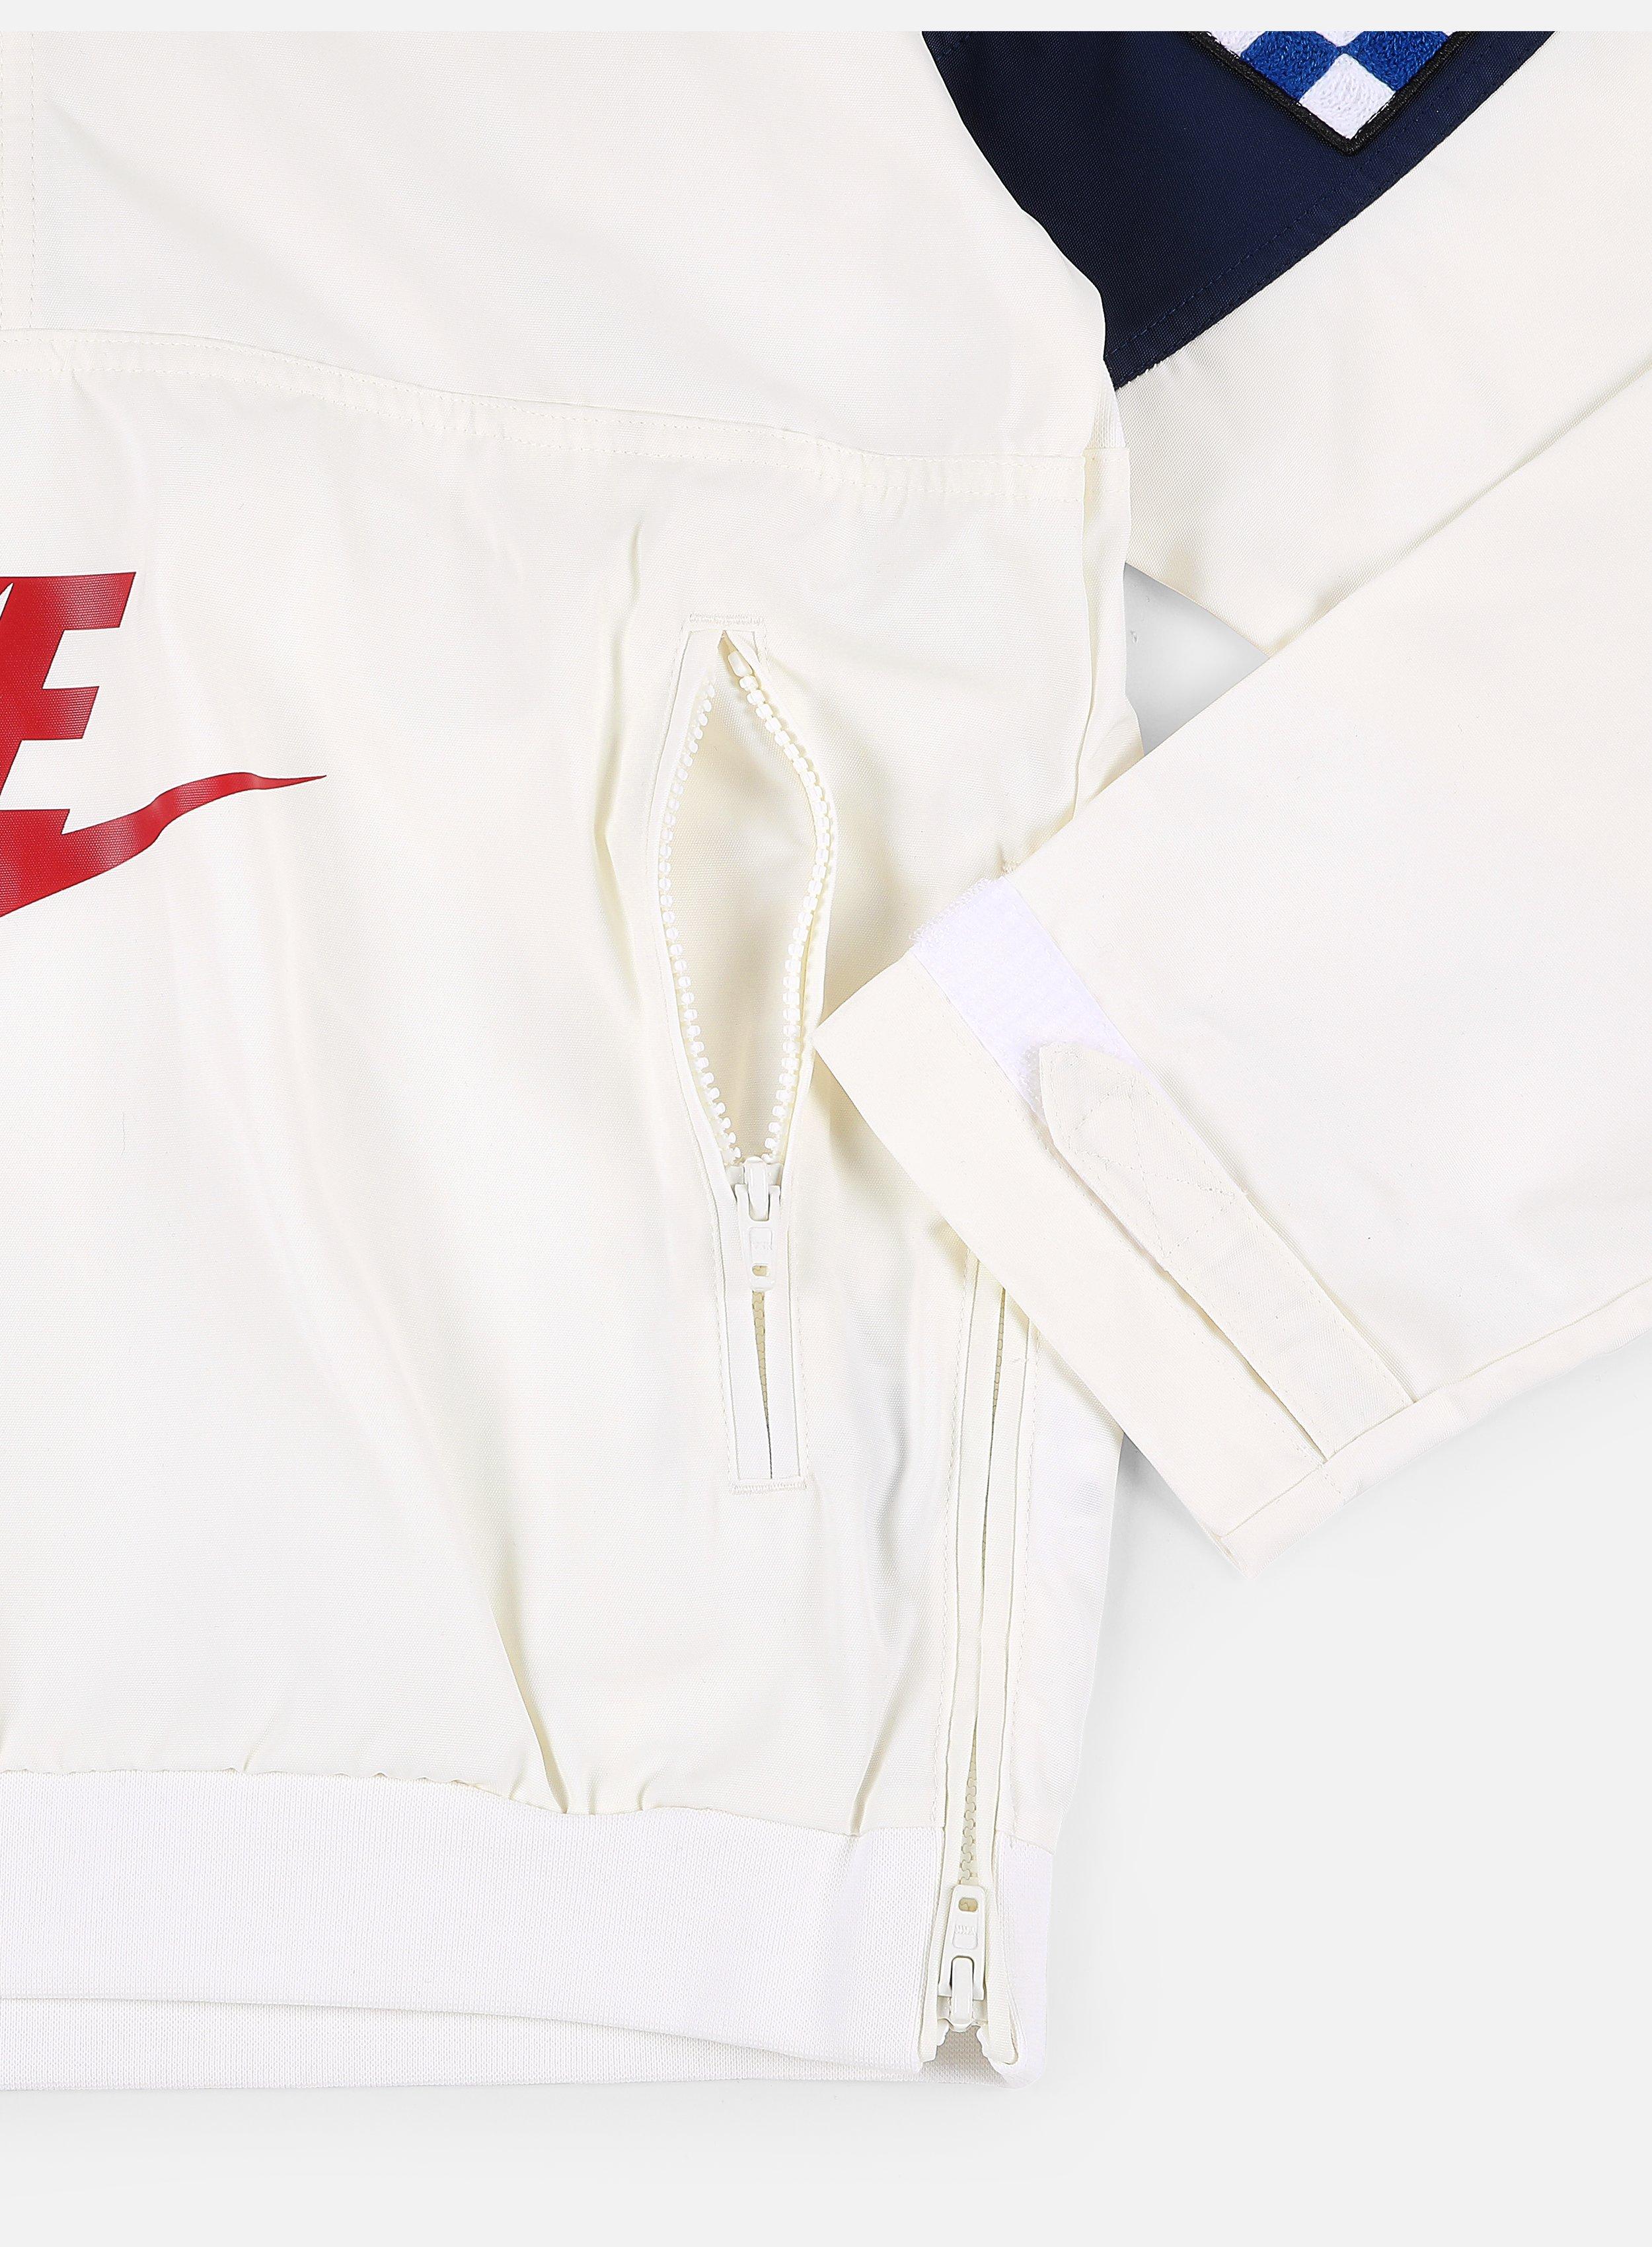 giacche-nike-nsw-reissue-walliwaw-woven-jacket-sail-midnight-navy-midnight-navy-302270-2500-4.jpg